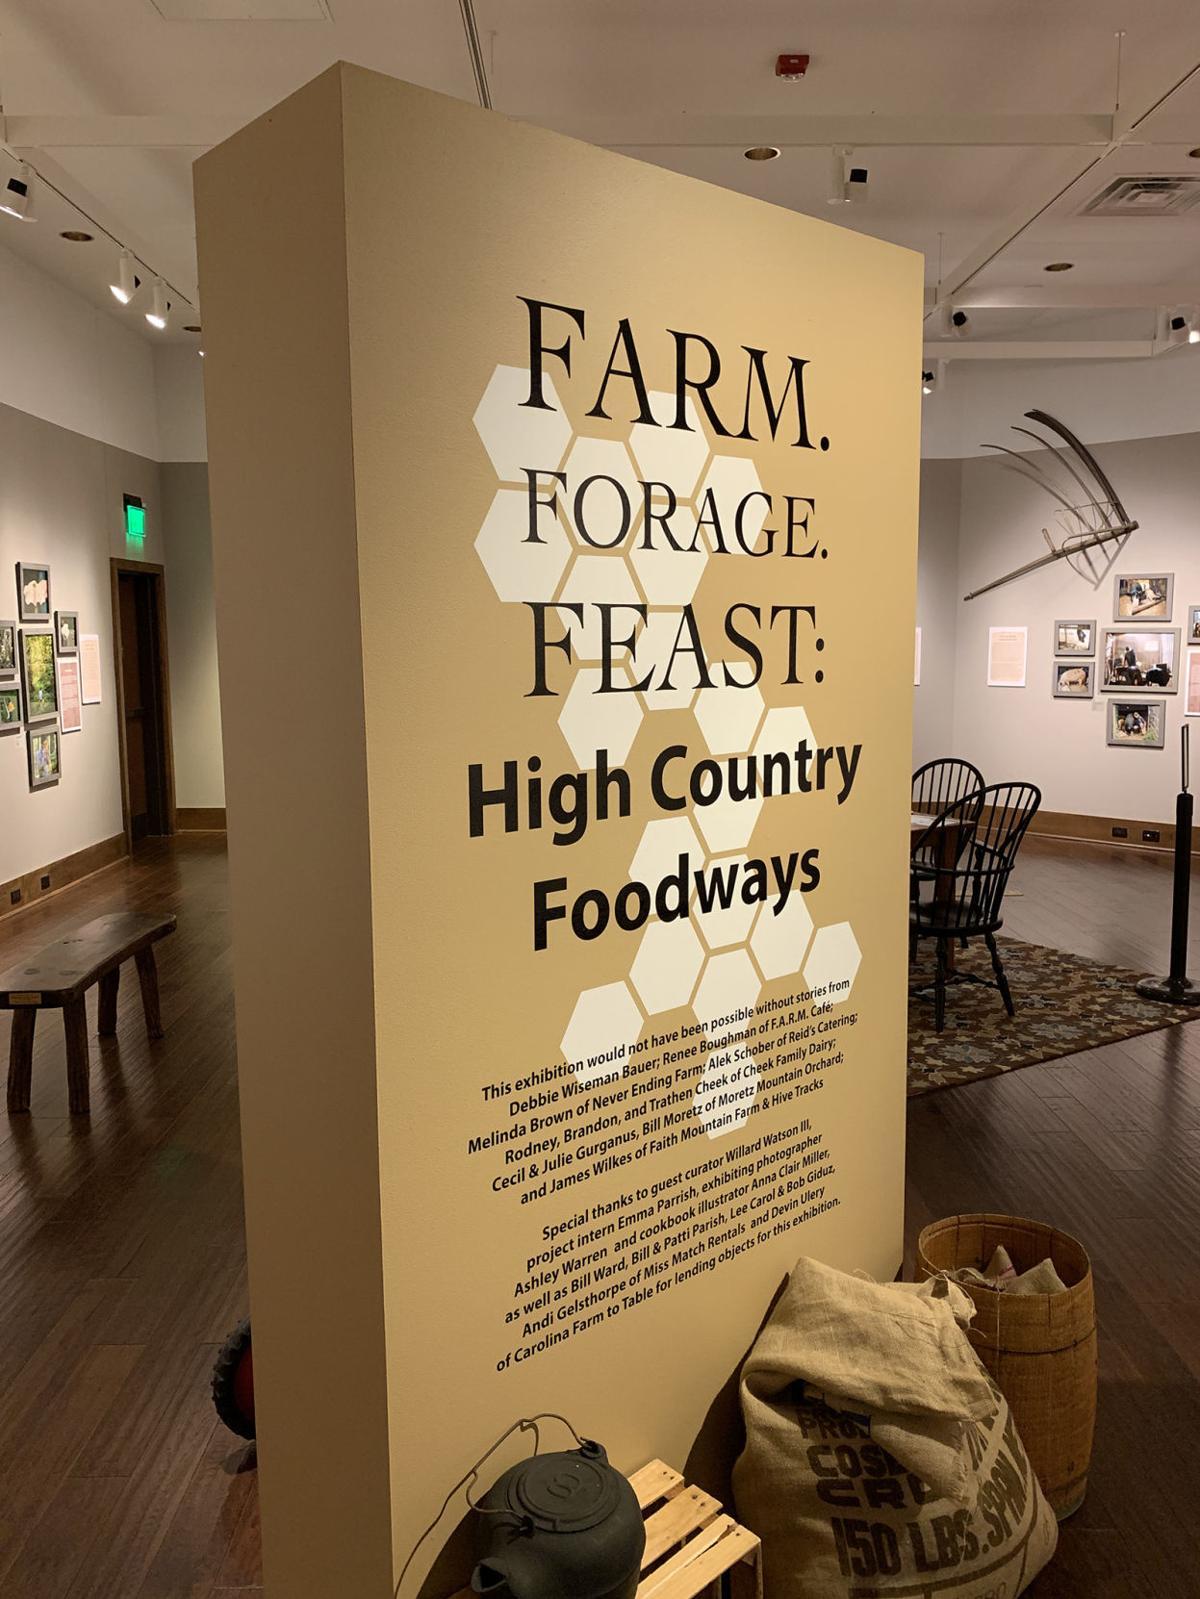 Blowing Rock museum exhibit showcases North Carolina foodways